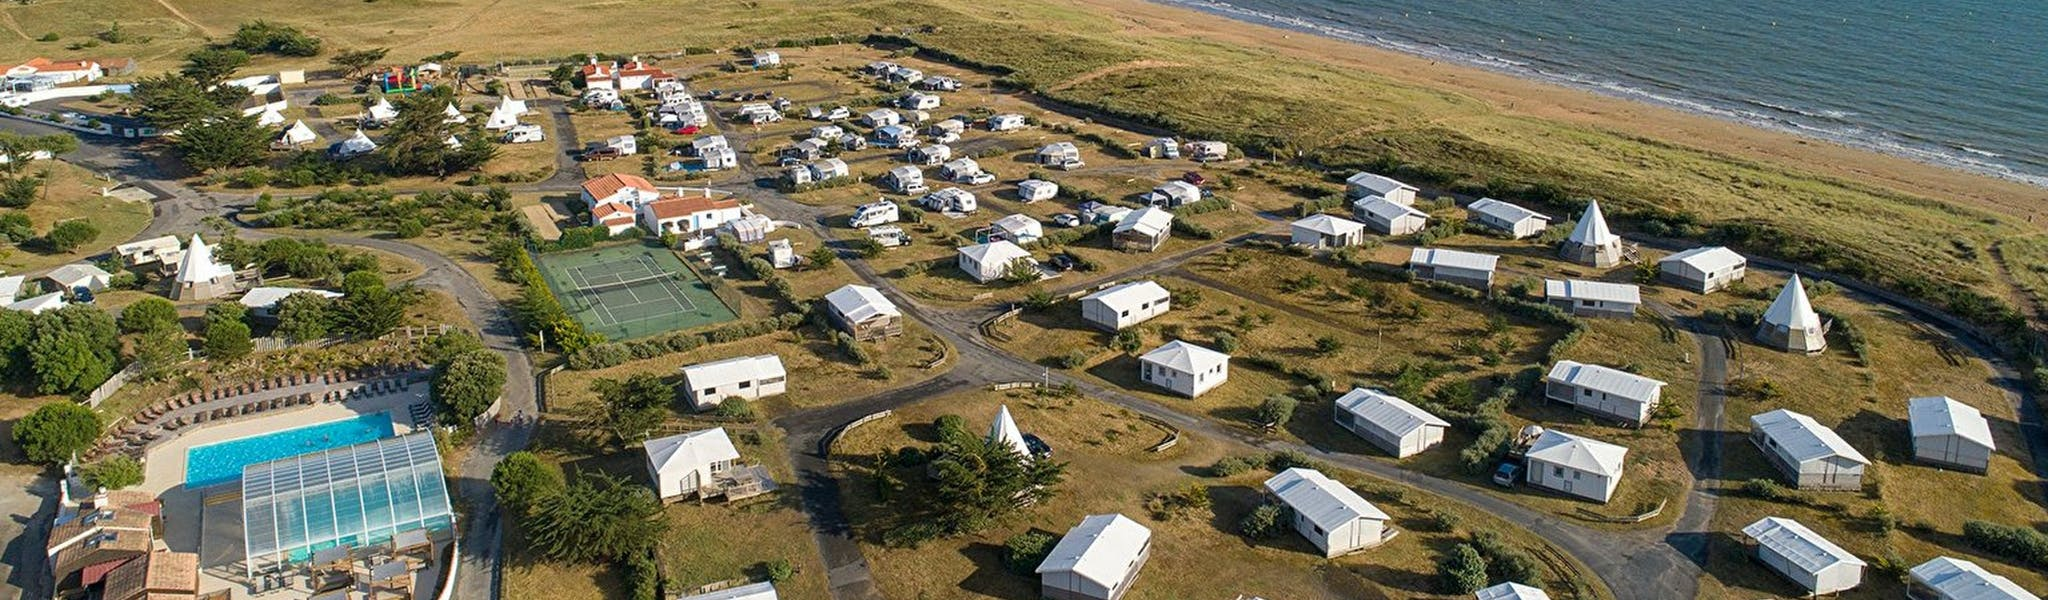 camping domaine le midi